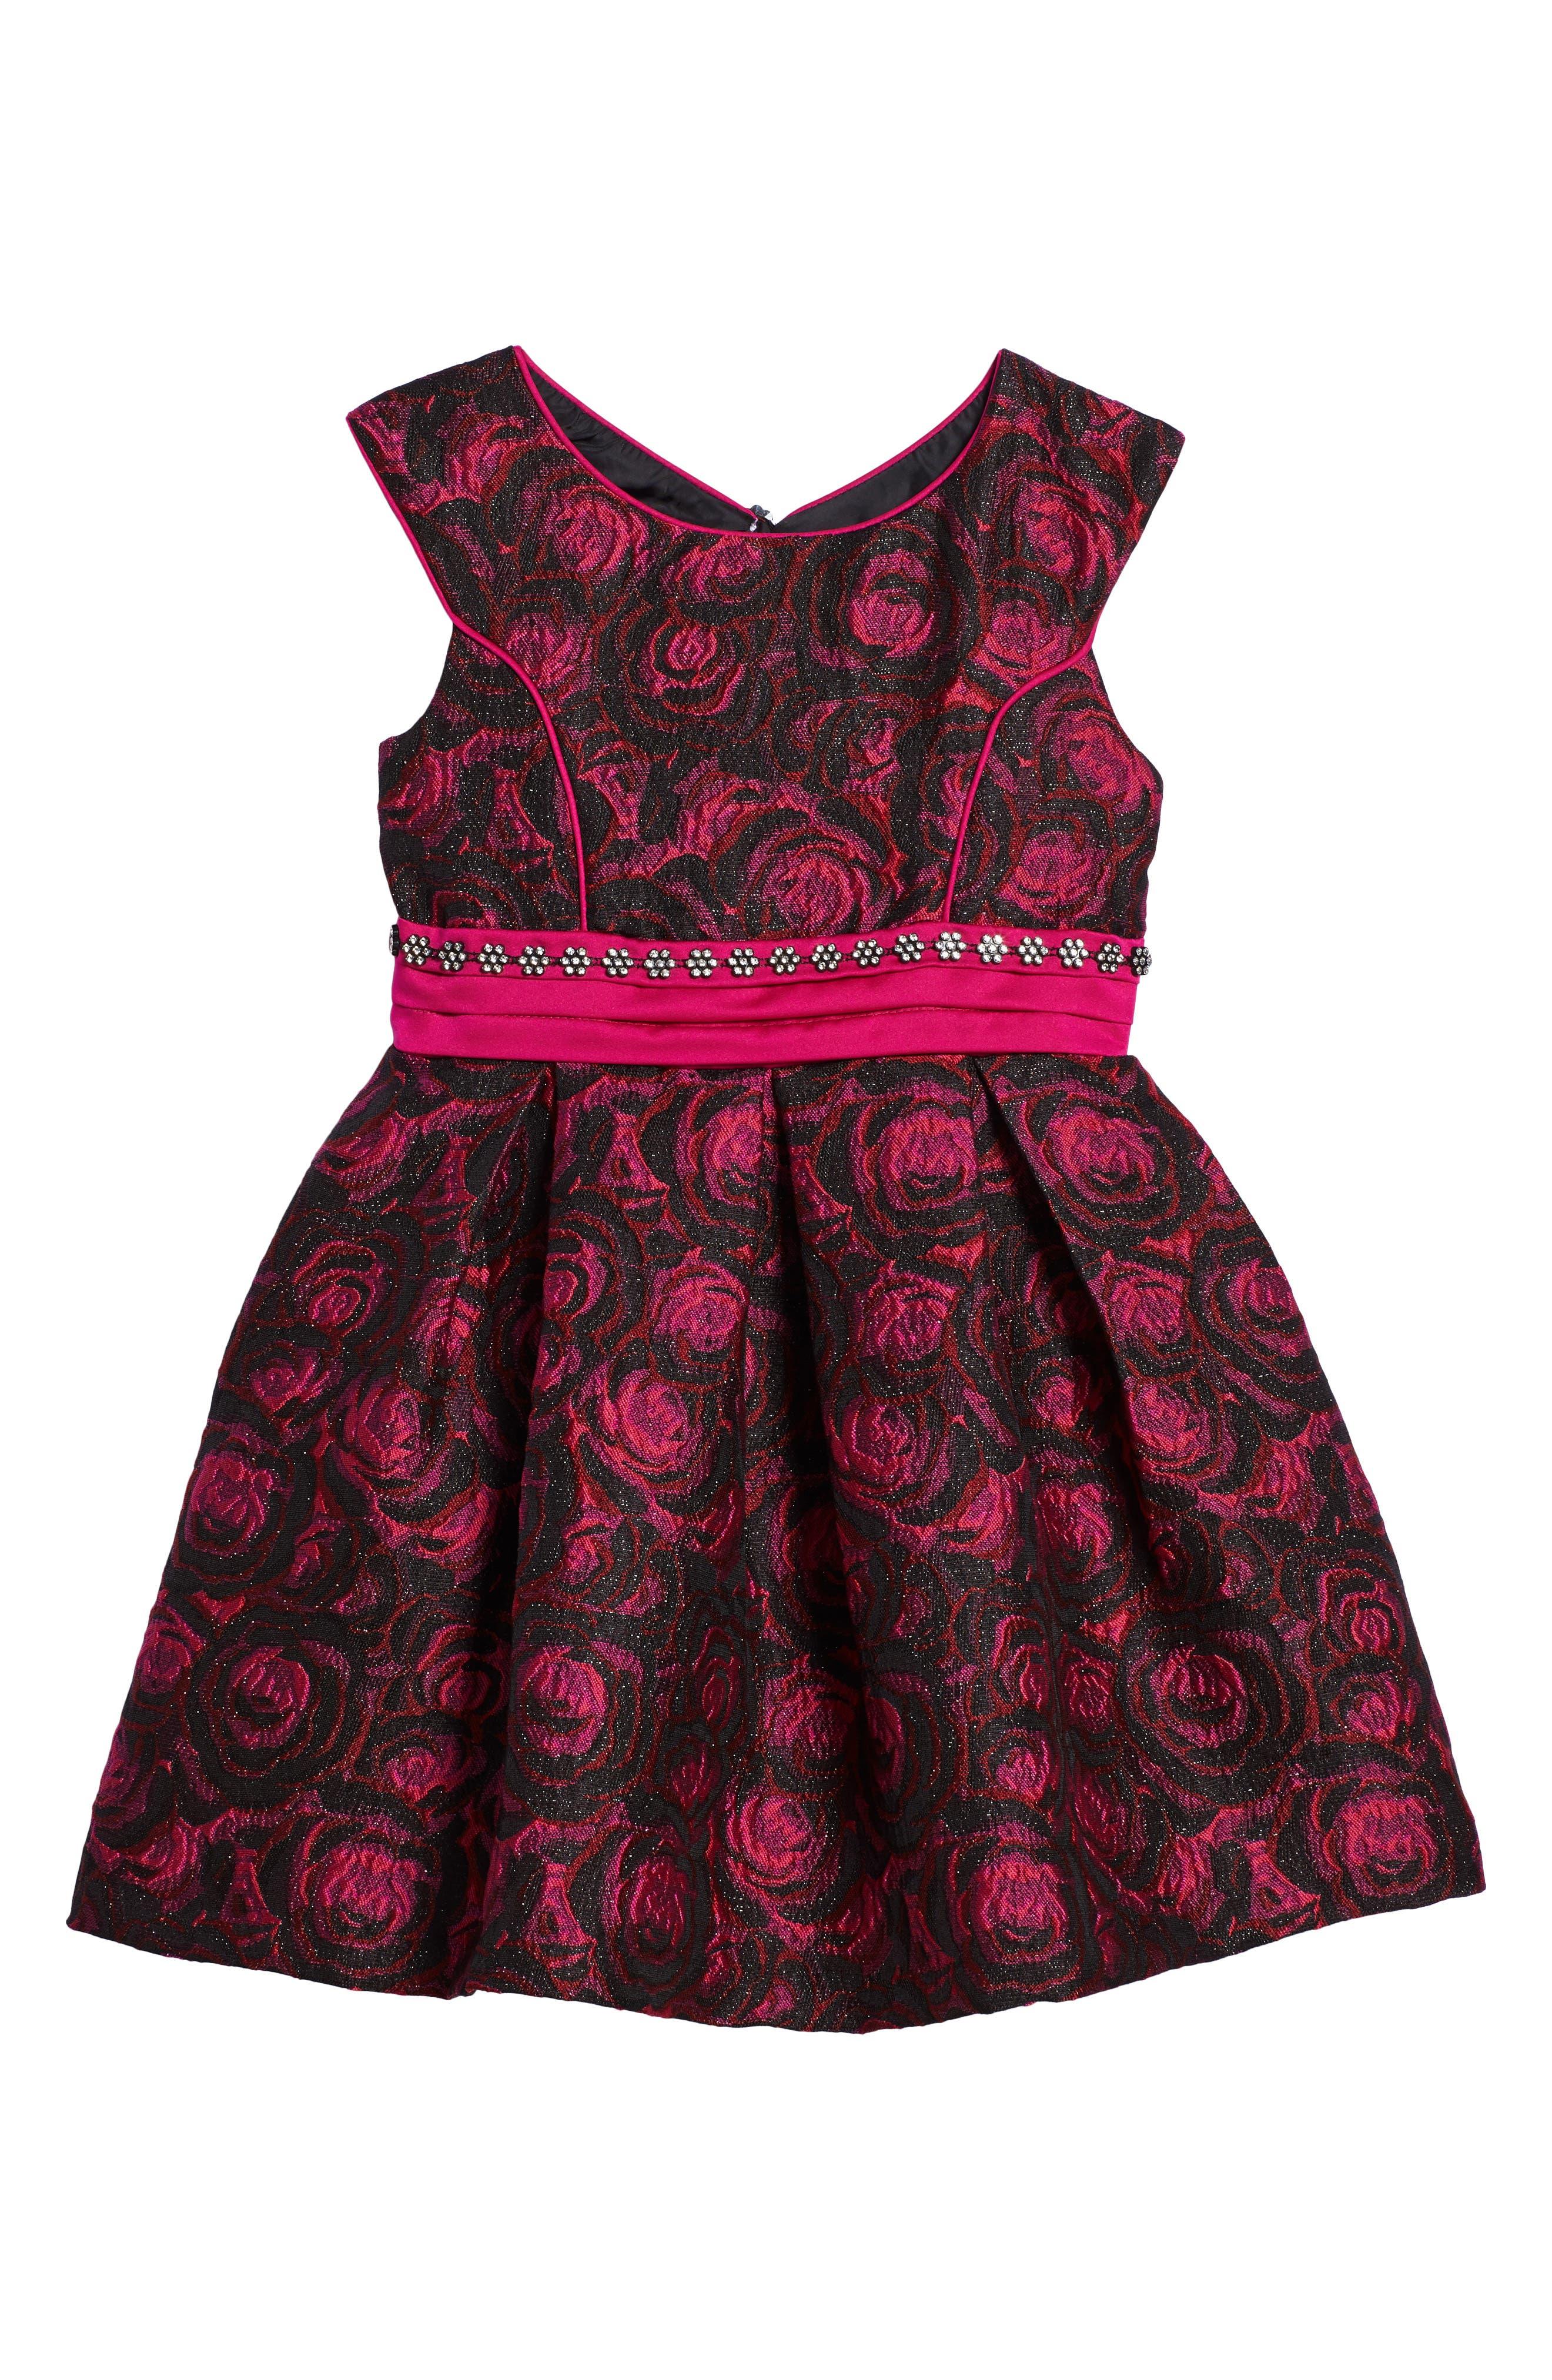 Iris & Ivy Floral Jacquard Dress (Toddler Girls & Little Girls)